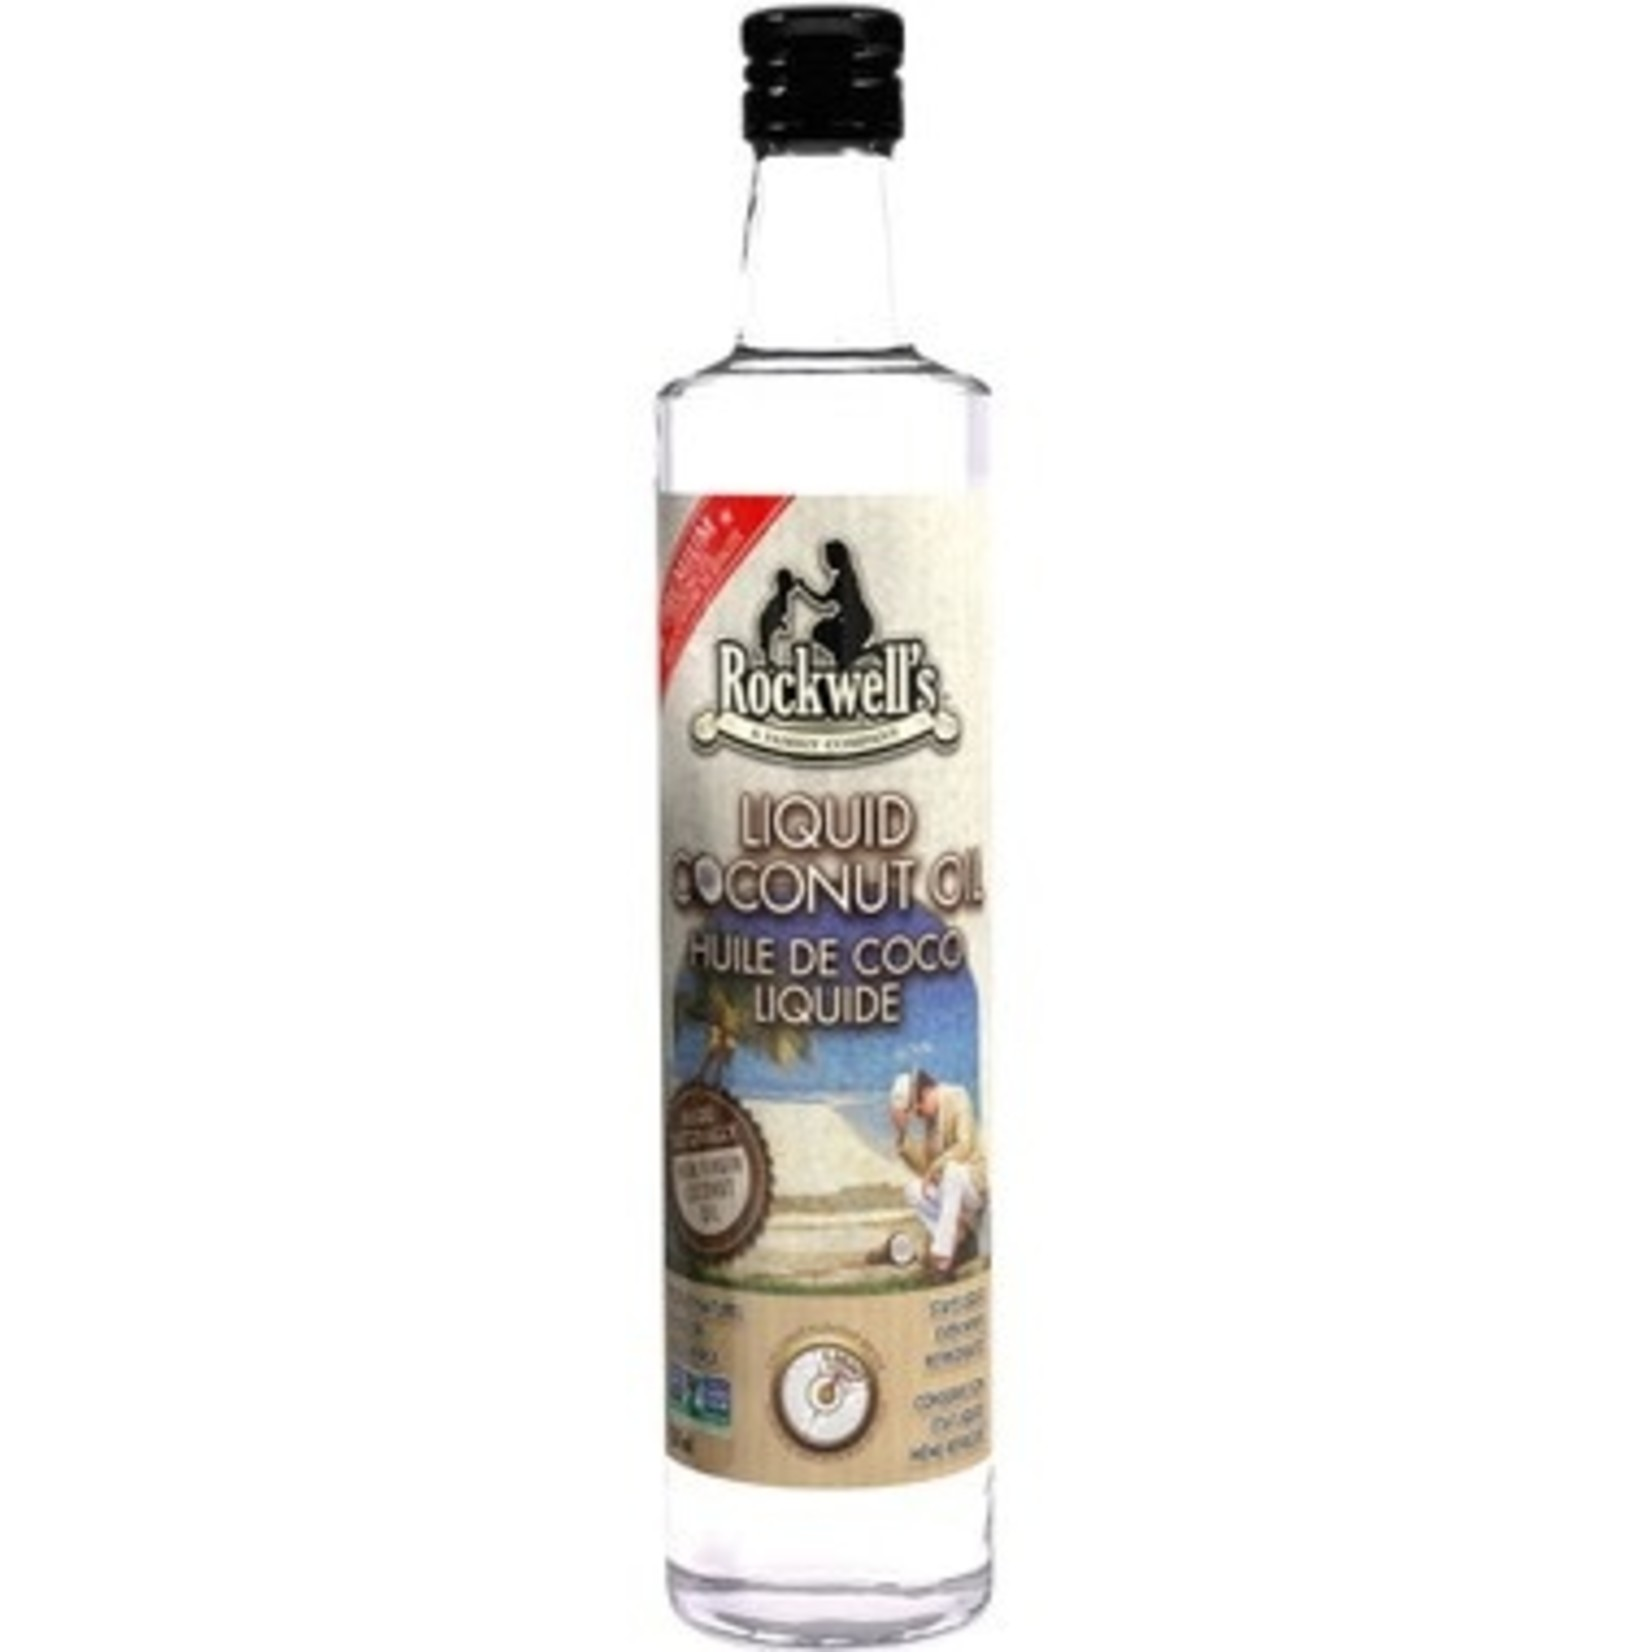 Rockwell's Coconut Oil 250 ml